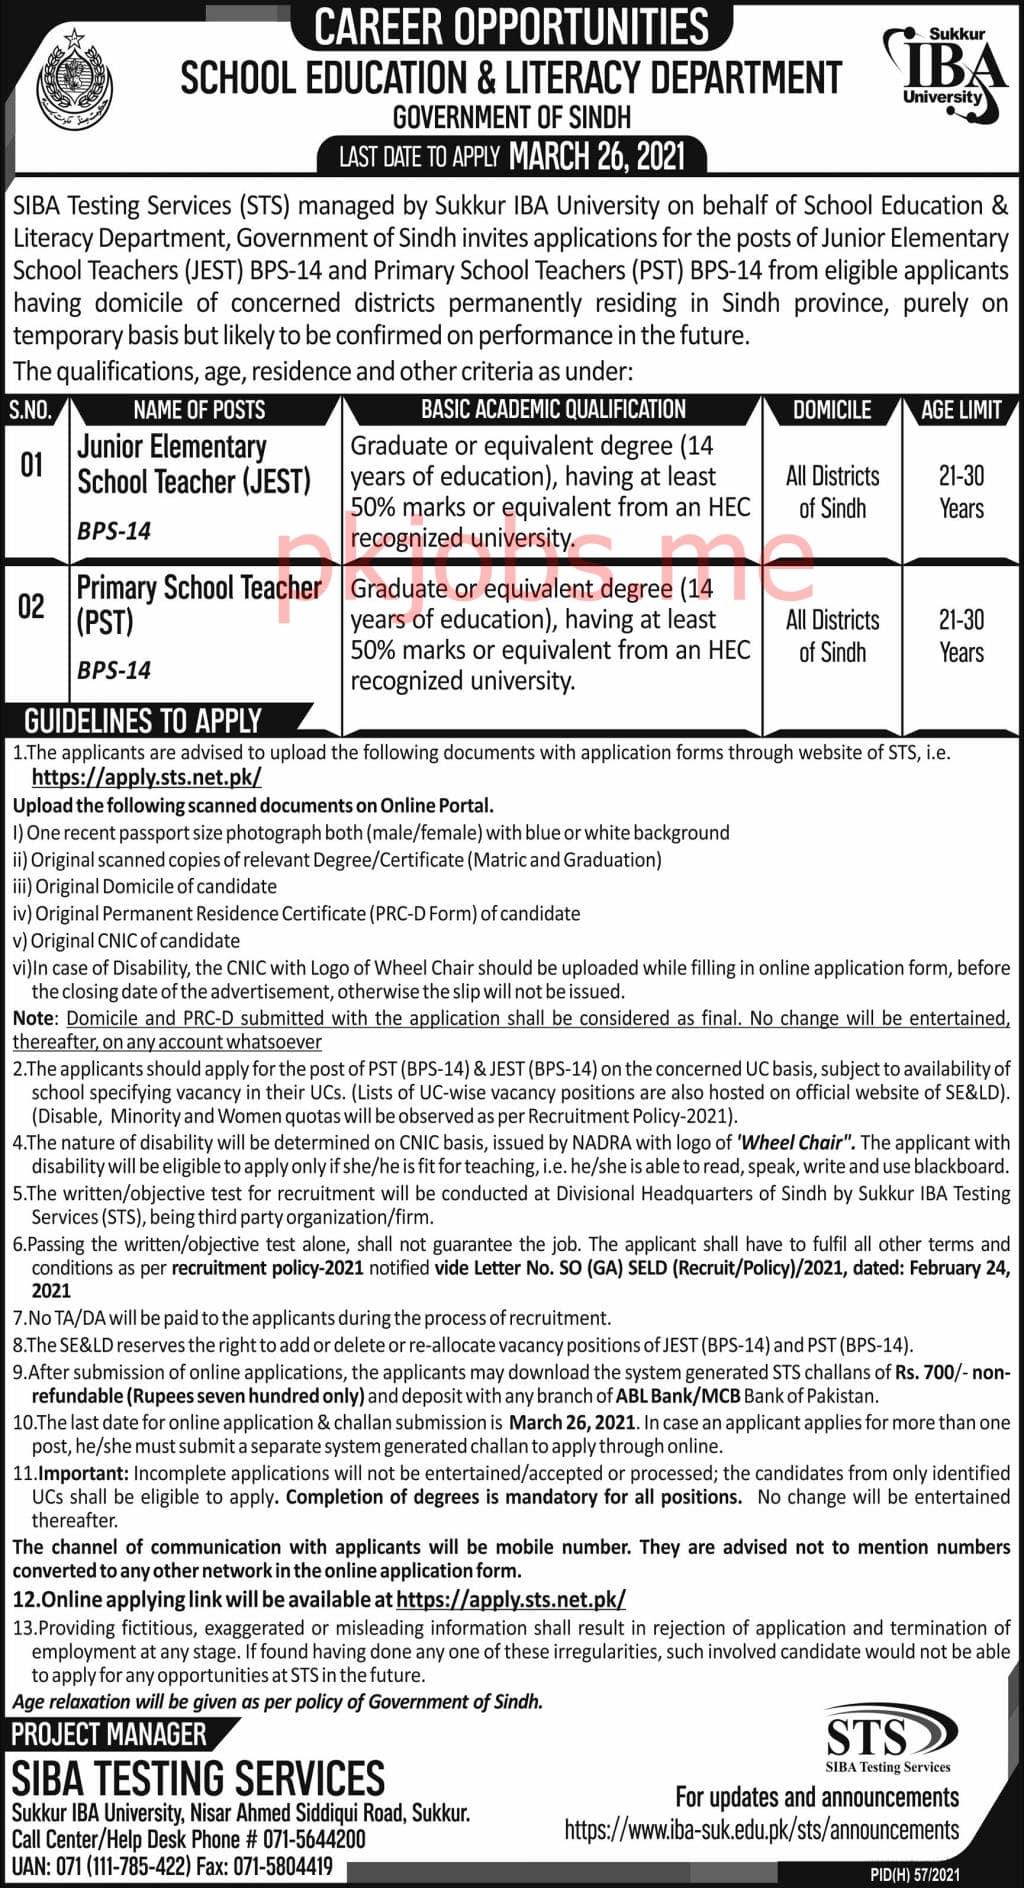 Latest School Education & Literacy Department Teaching Posts 2021